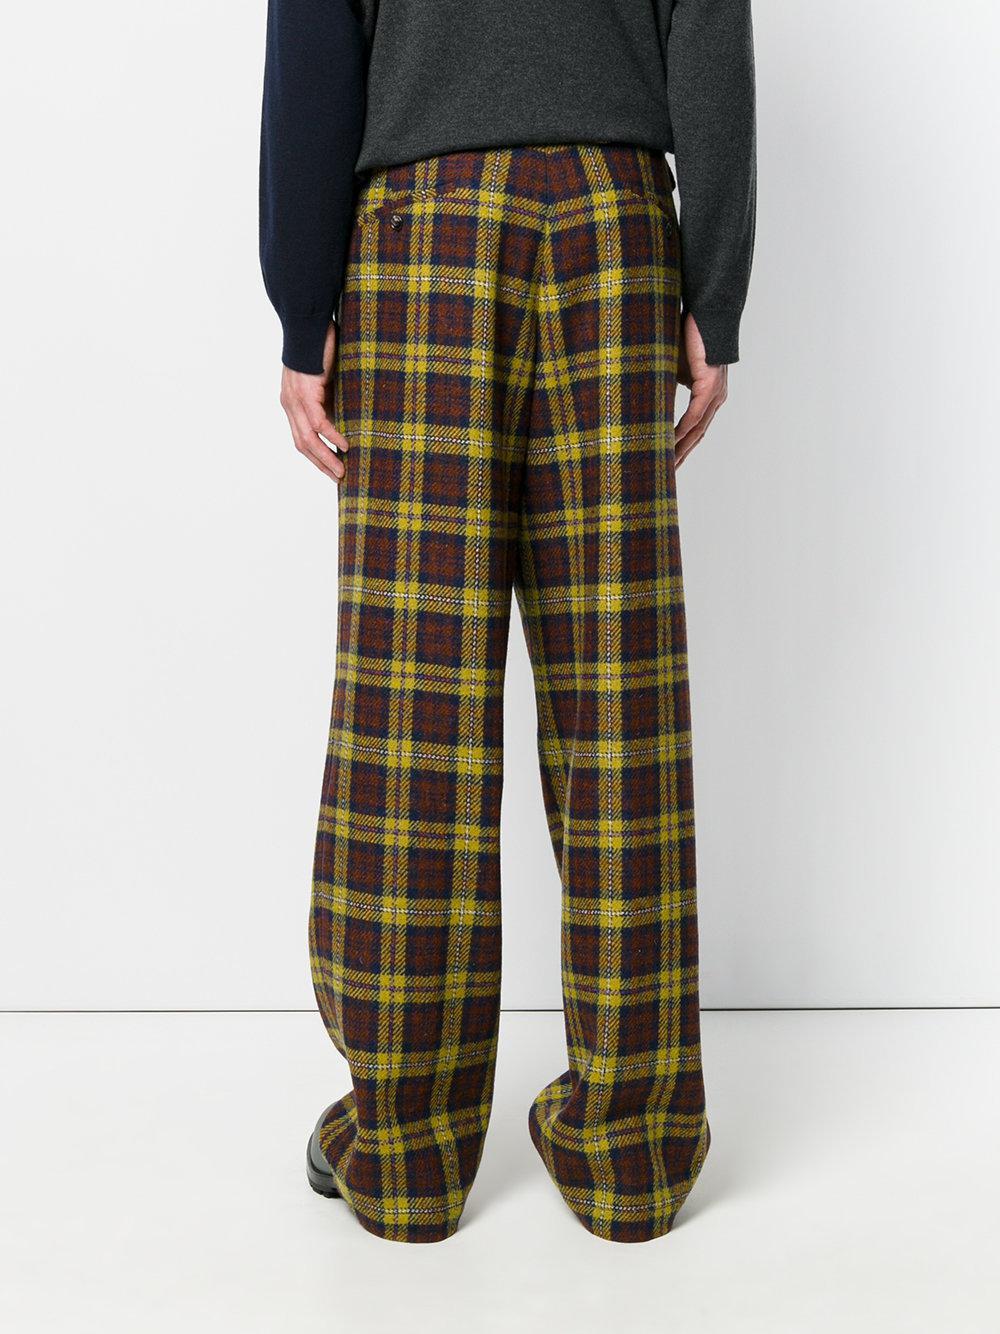 Marni Cotton Tartan Trousers for Men